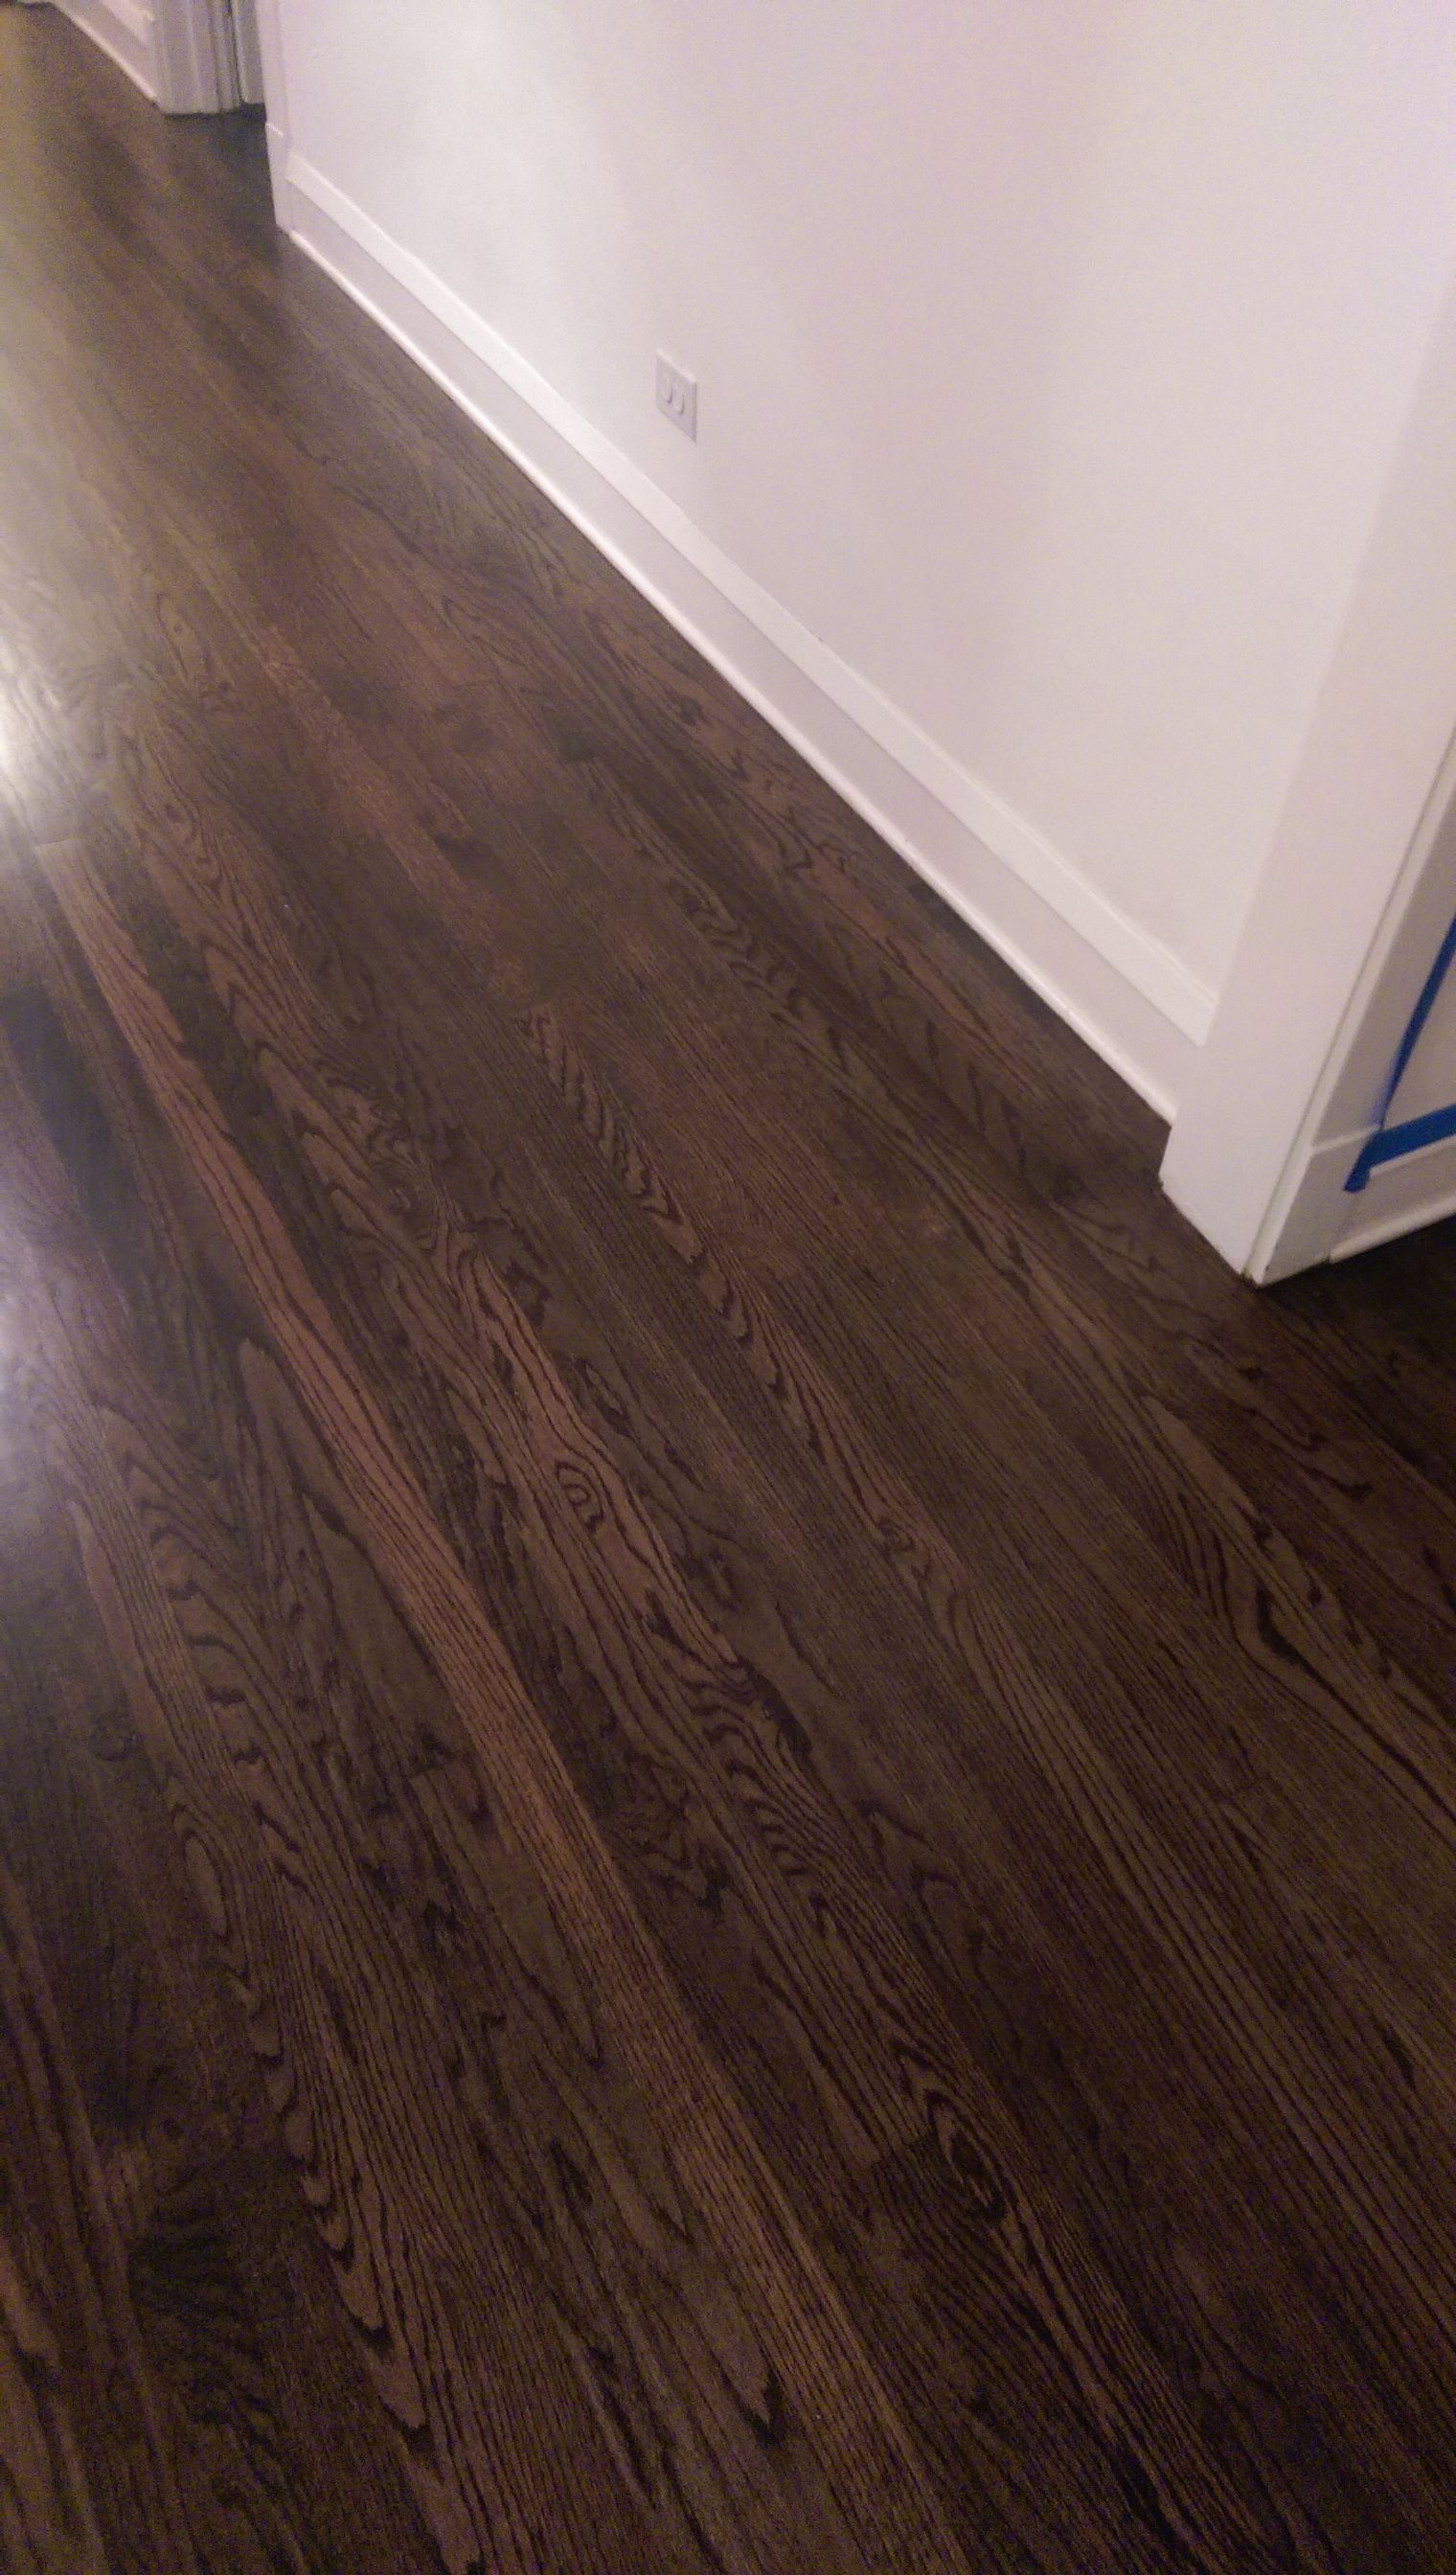 Floor Stain, Dark Walnut, Hardwood, Natural Wood, Hardwood Floor